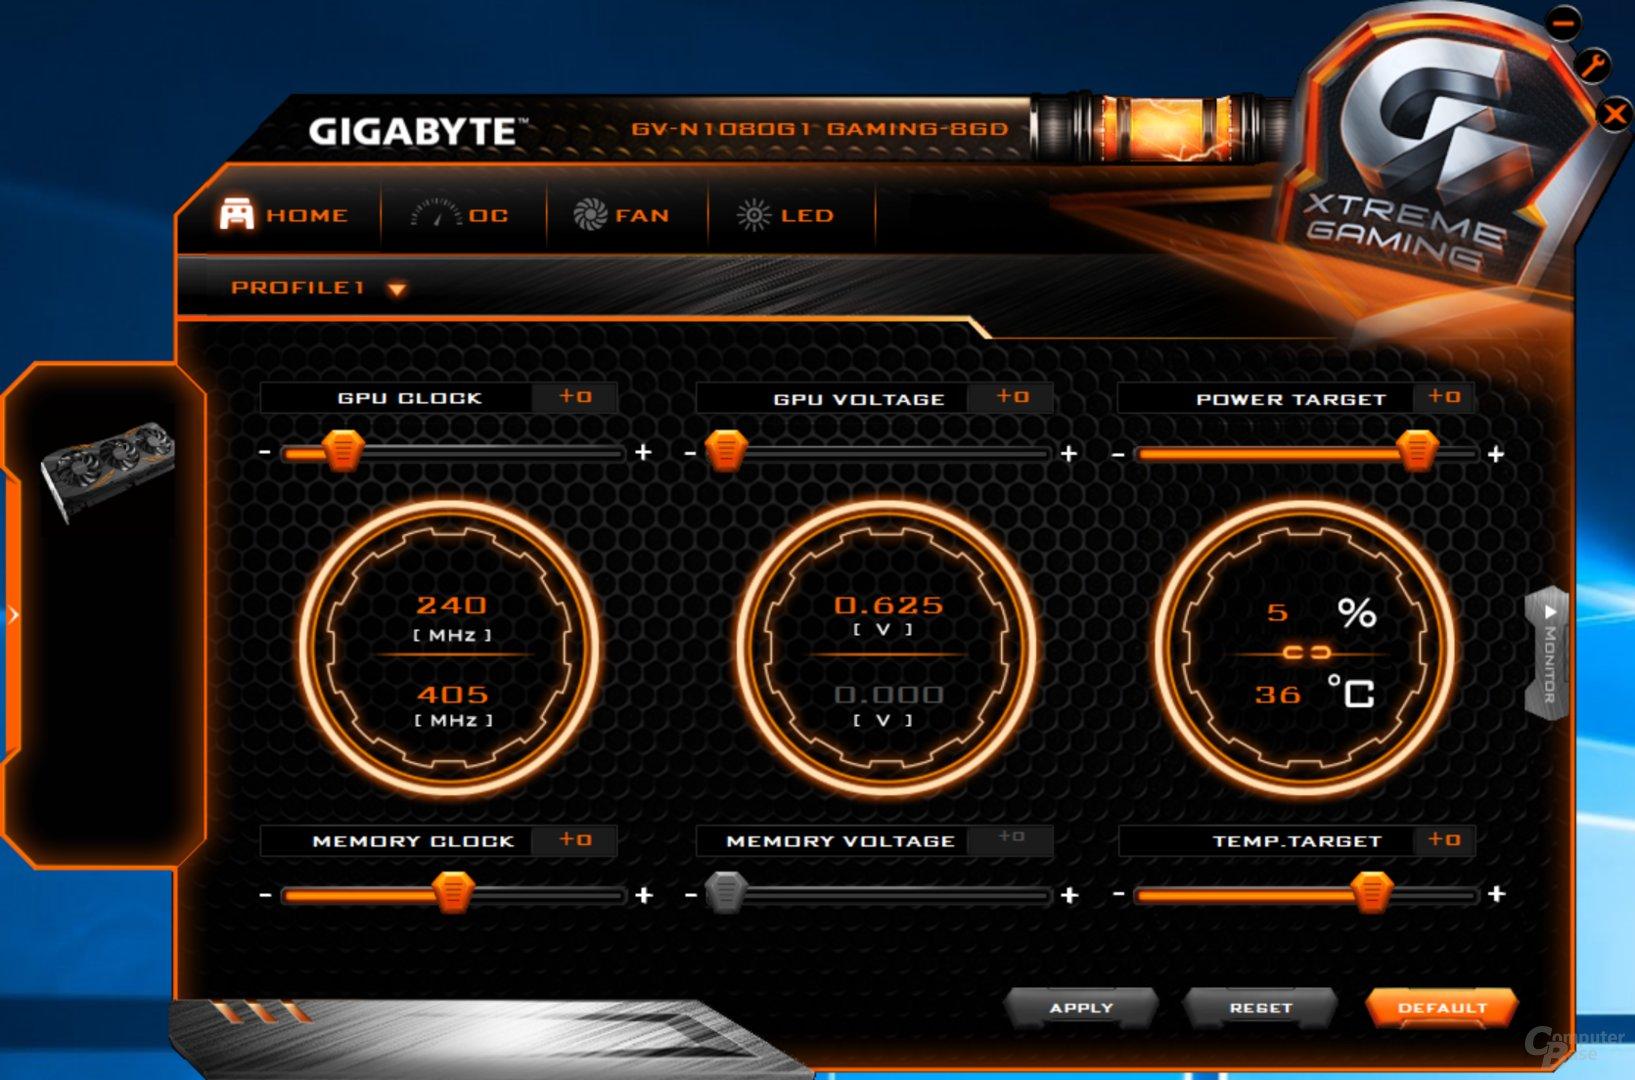 Gigabyte GTX 1080 – Xtreme Gaming Tool